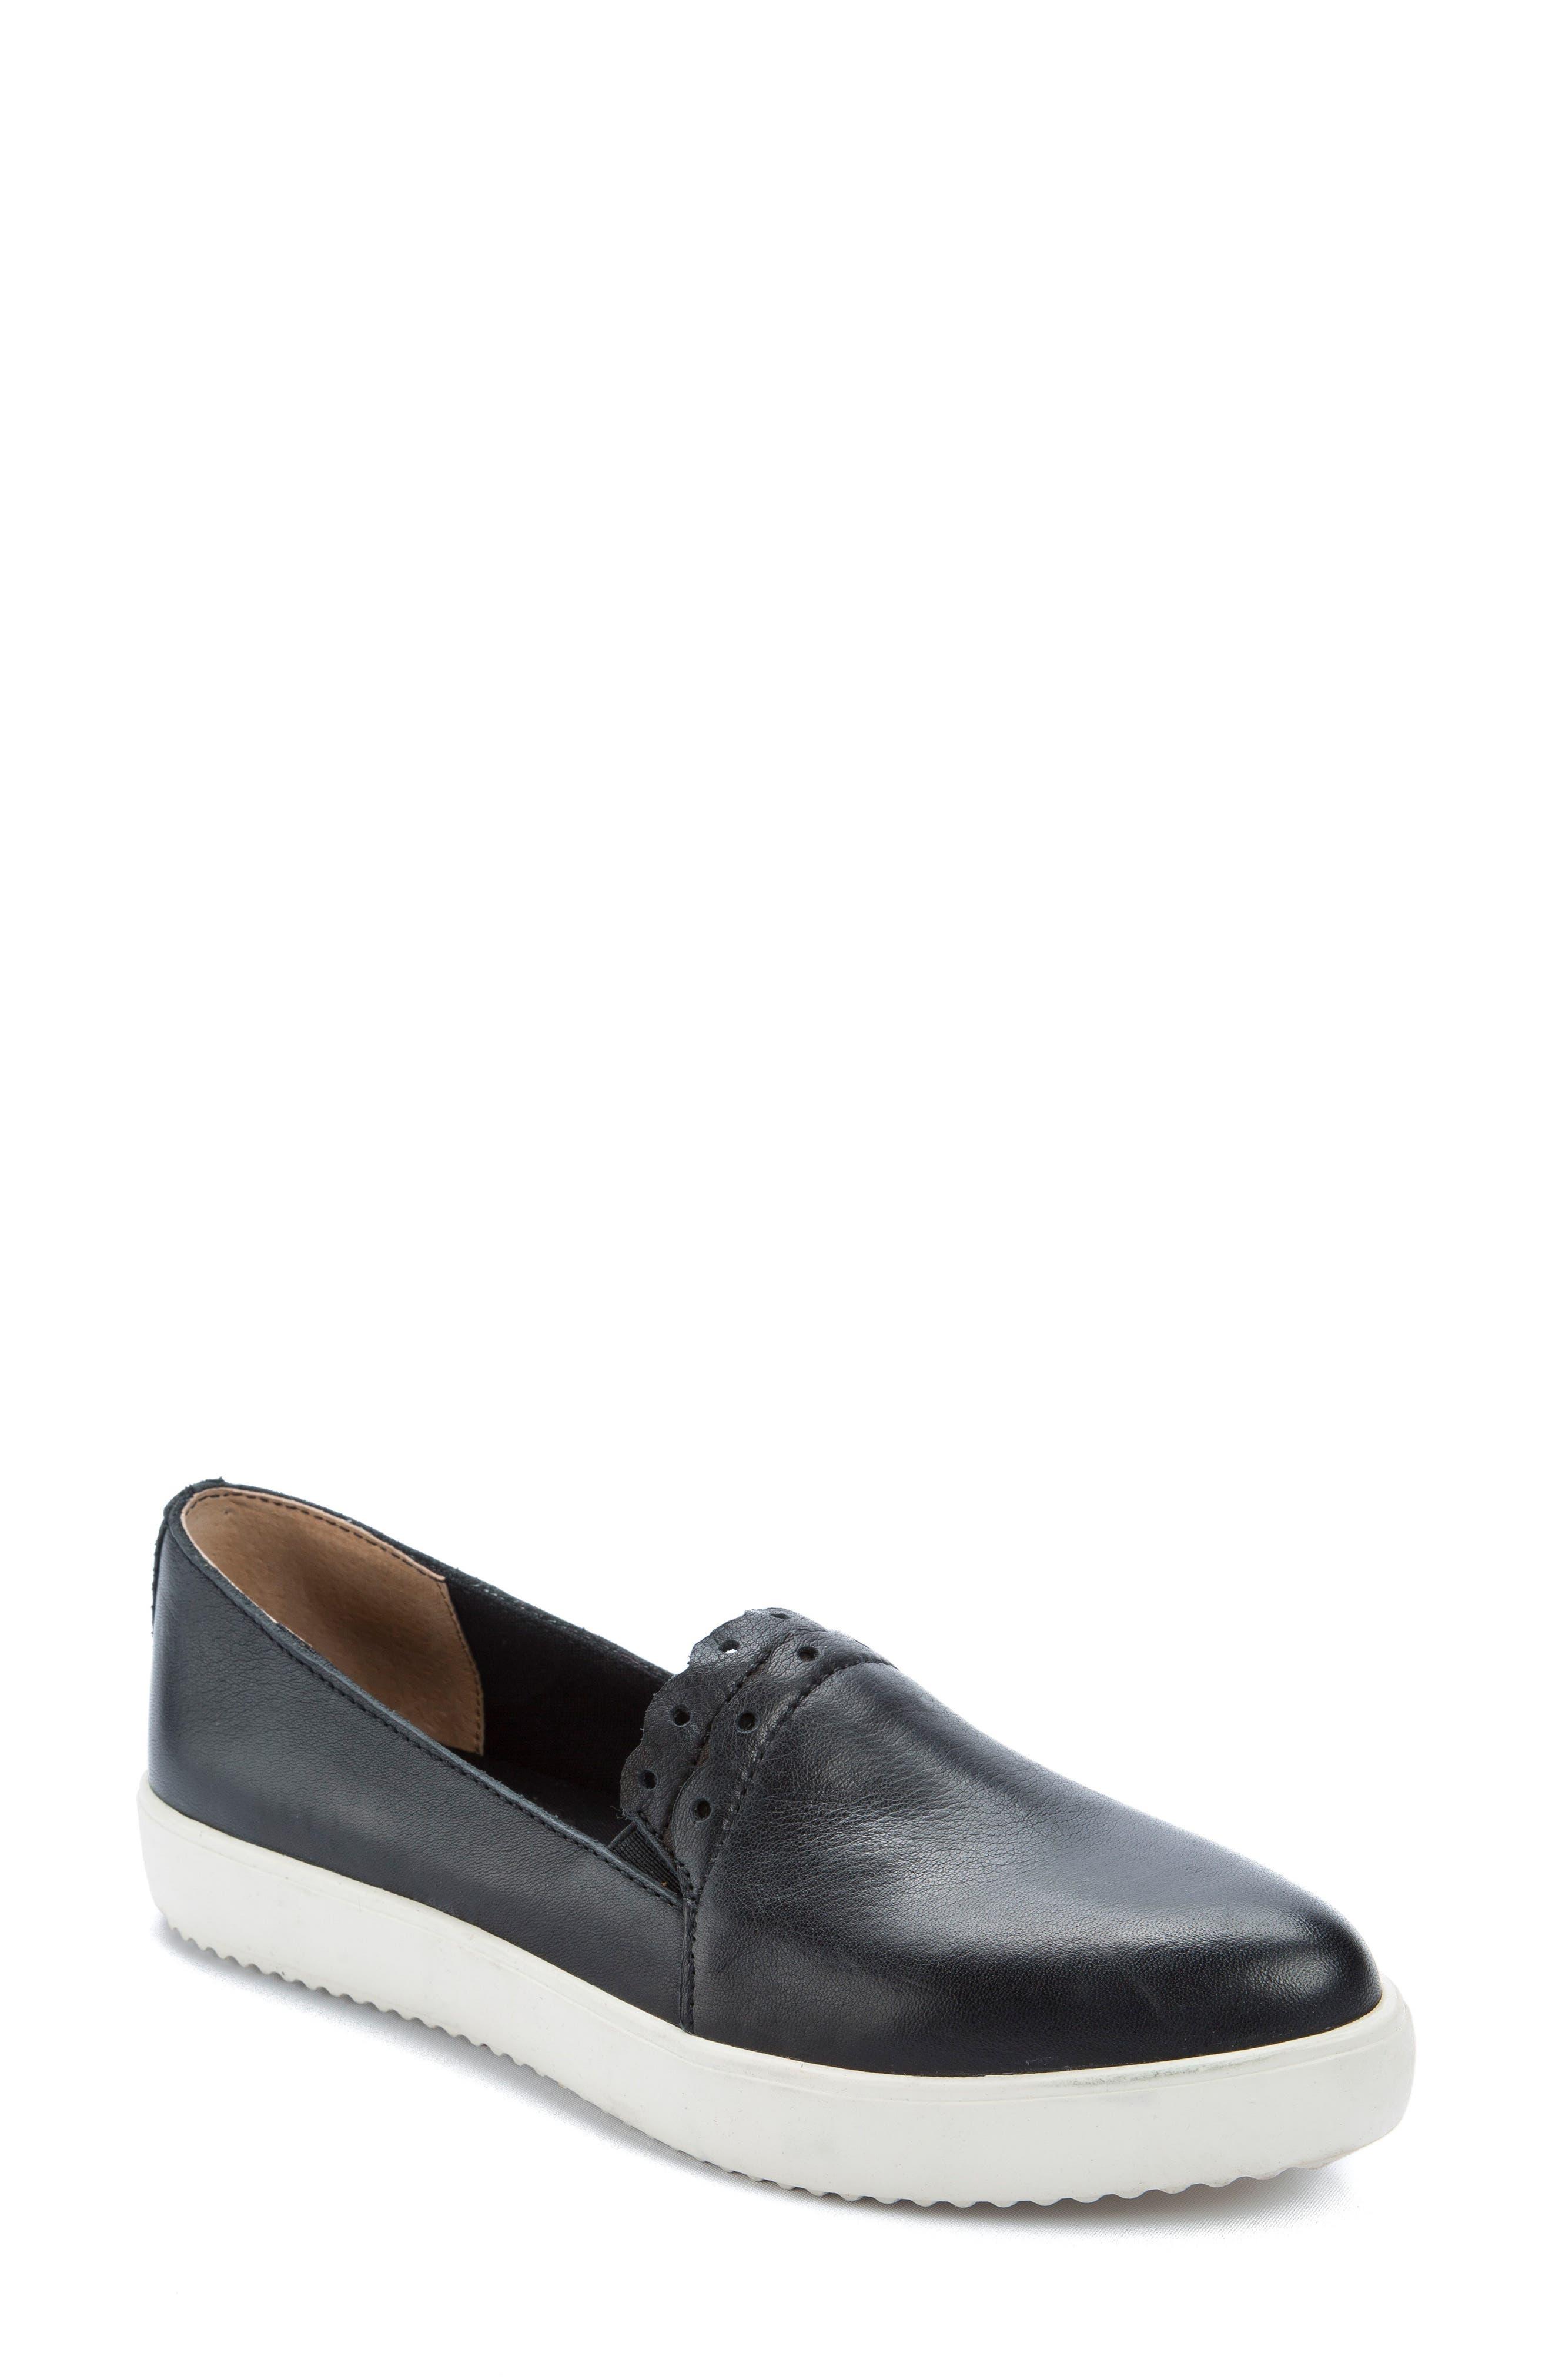 Roe Slip-On Sneaker,                         Main,                         color, Black